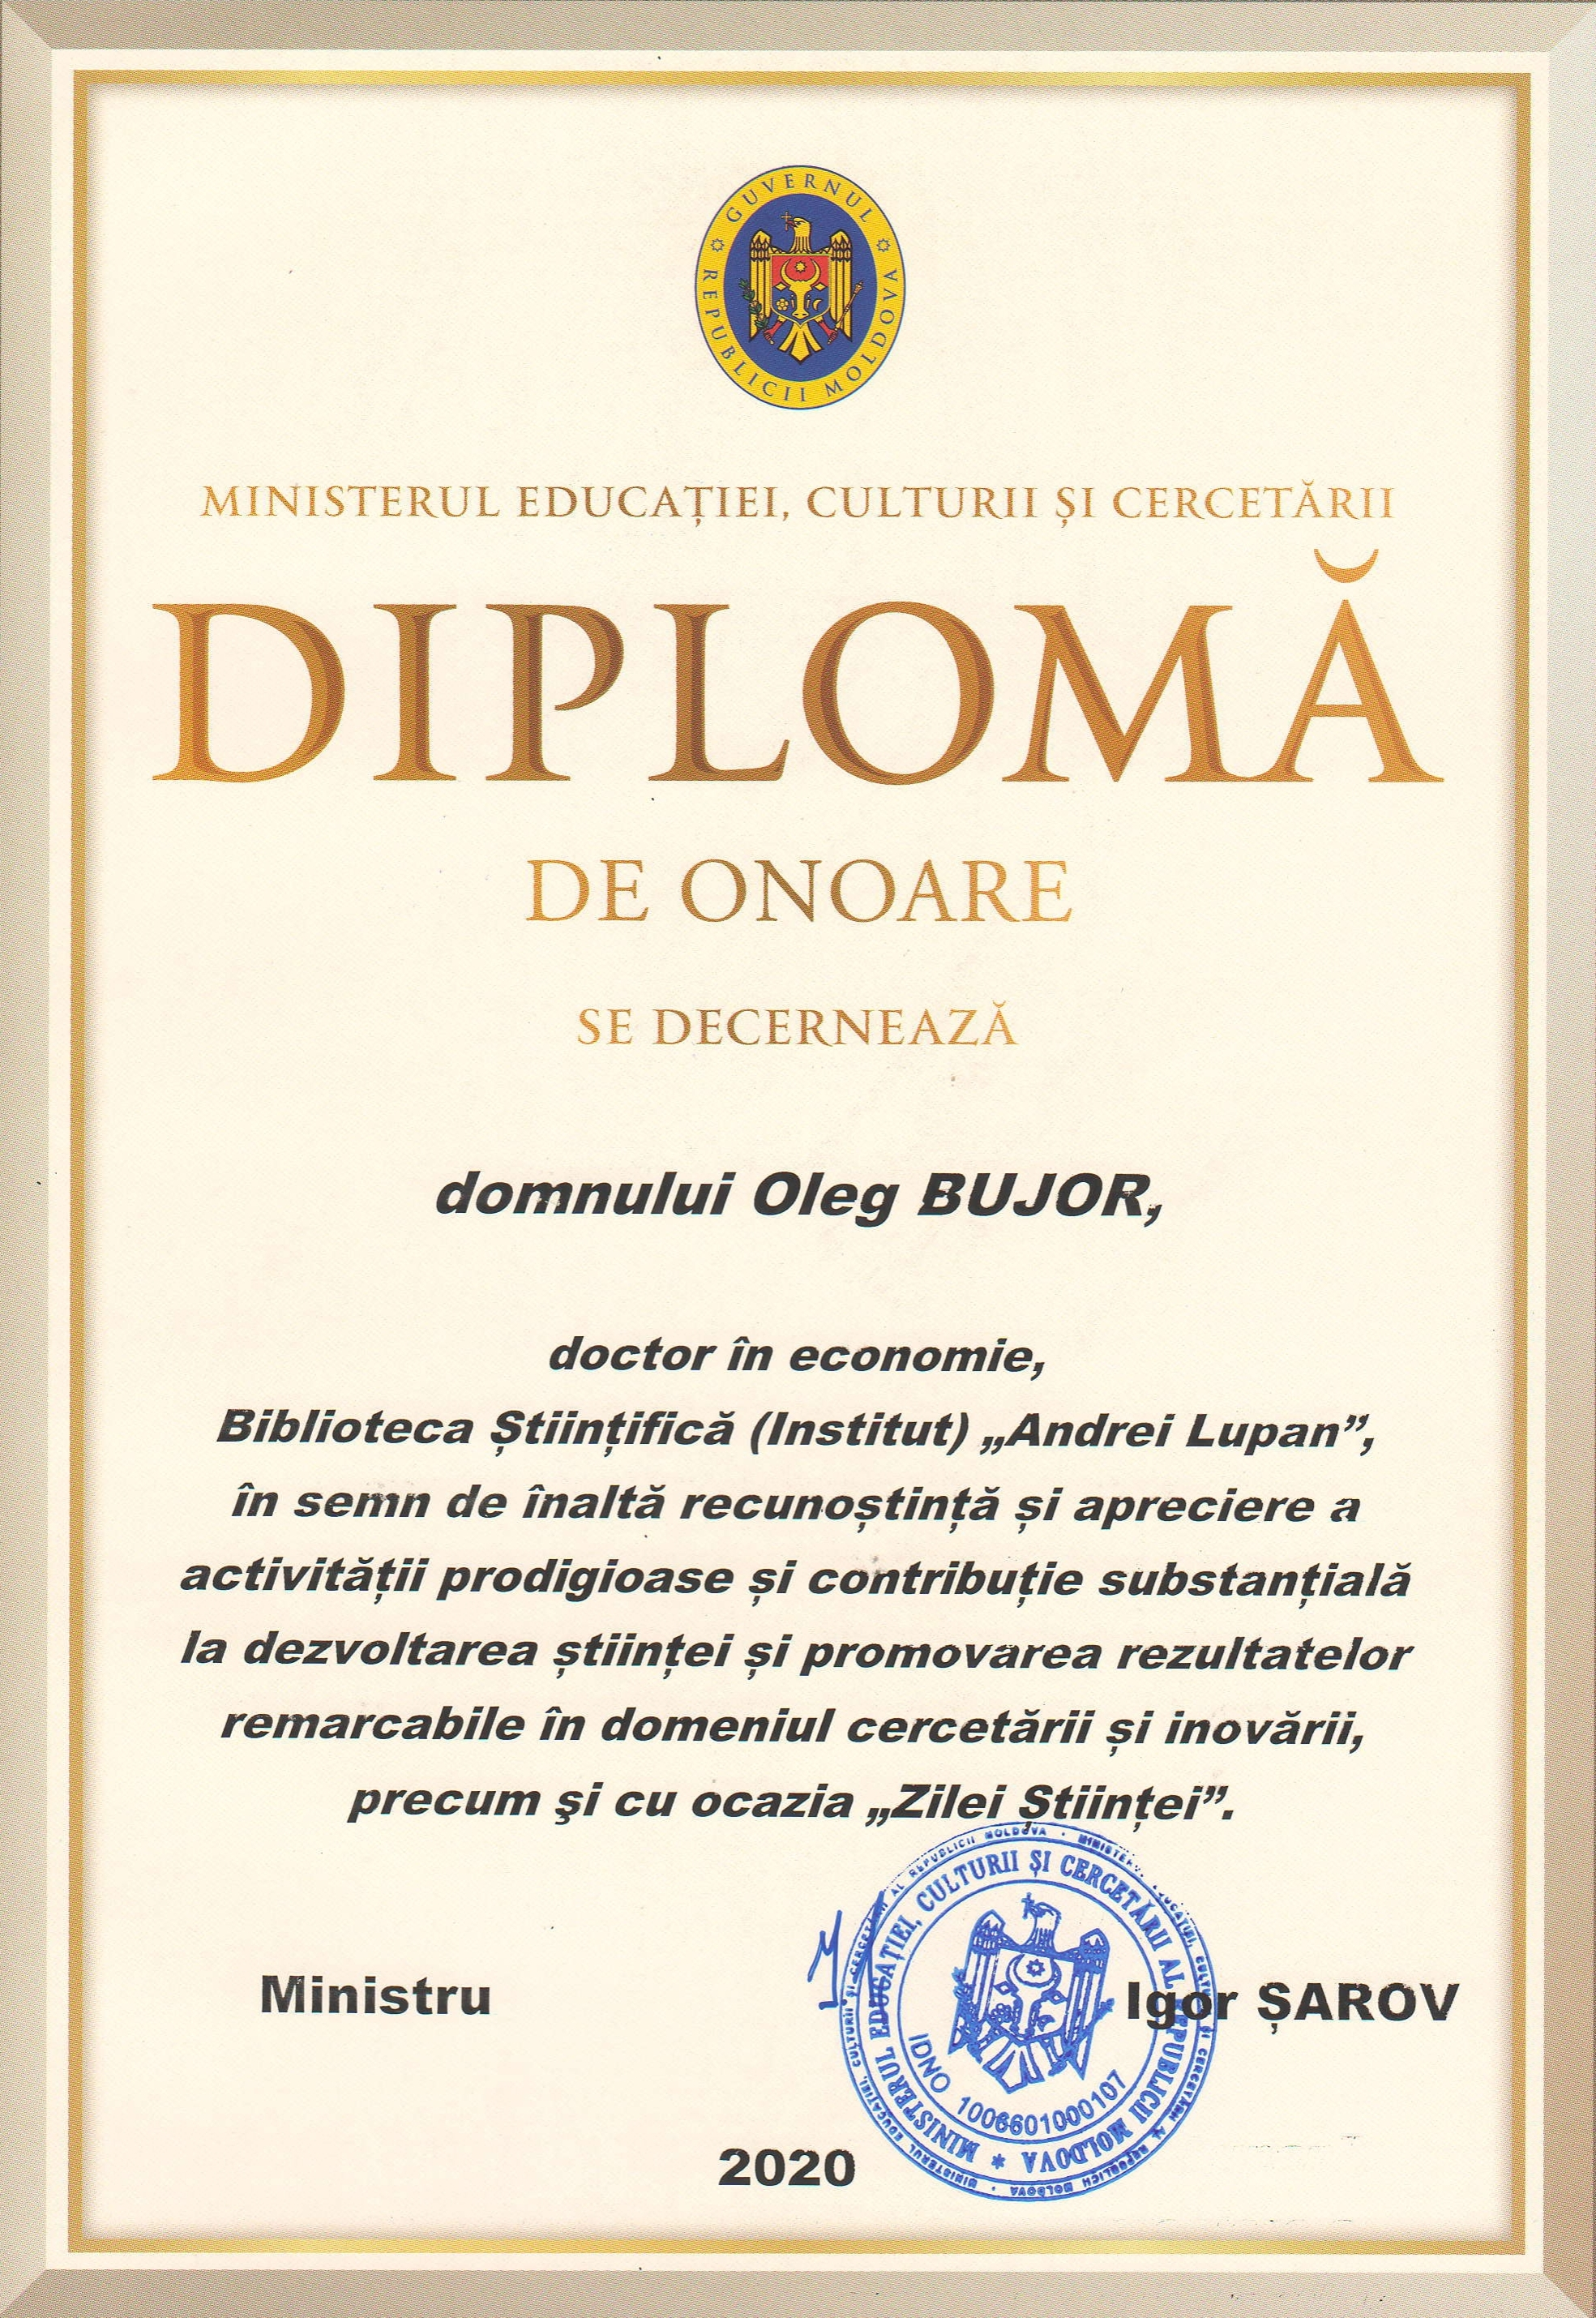 Diploma_Min. Culturii_10.11.2020_001